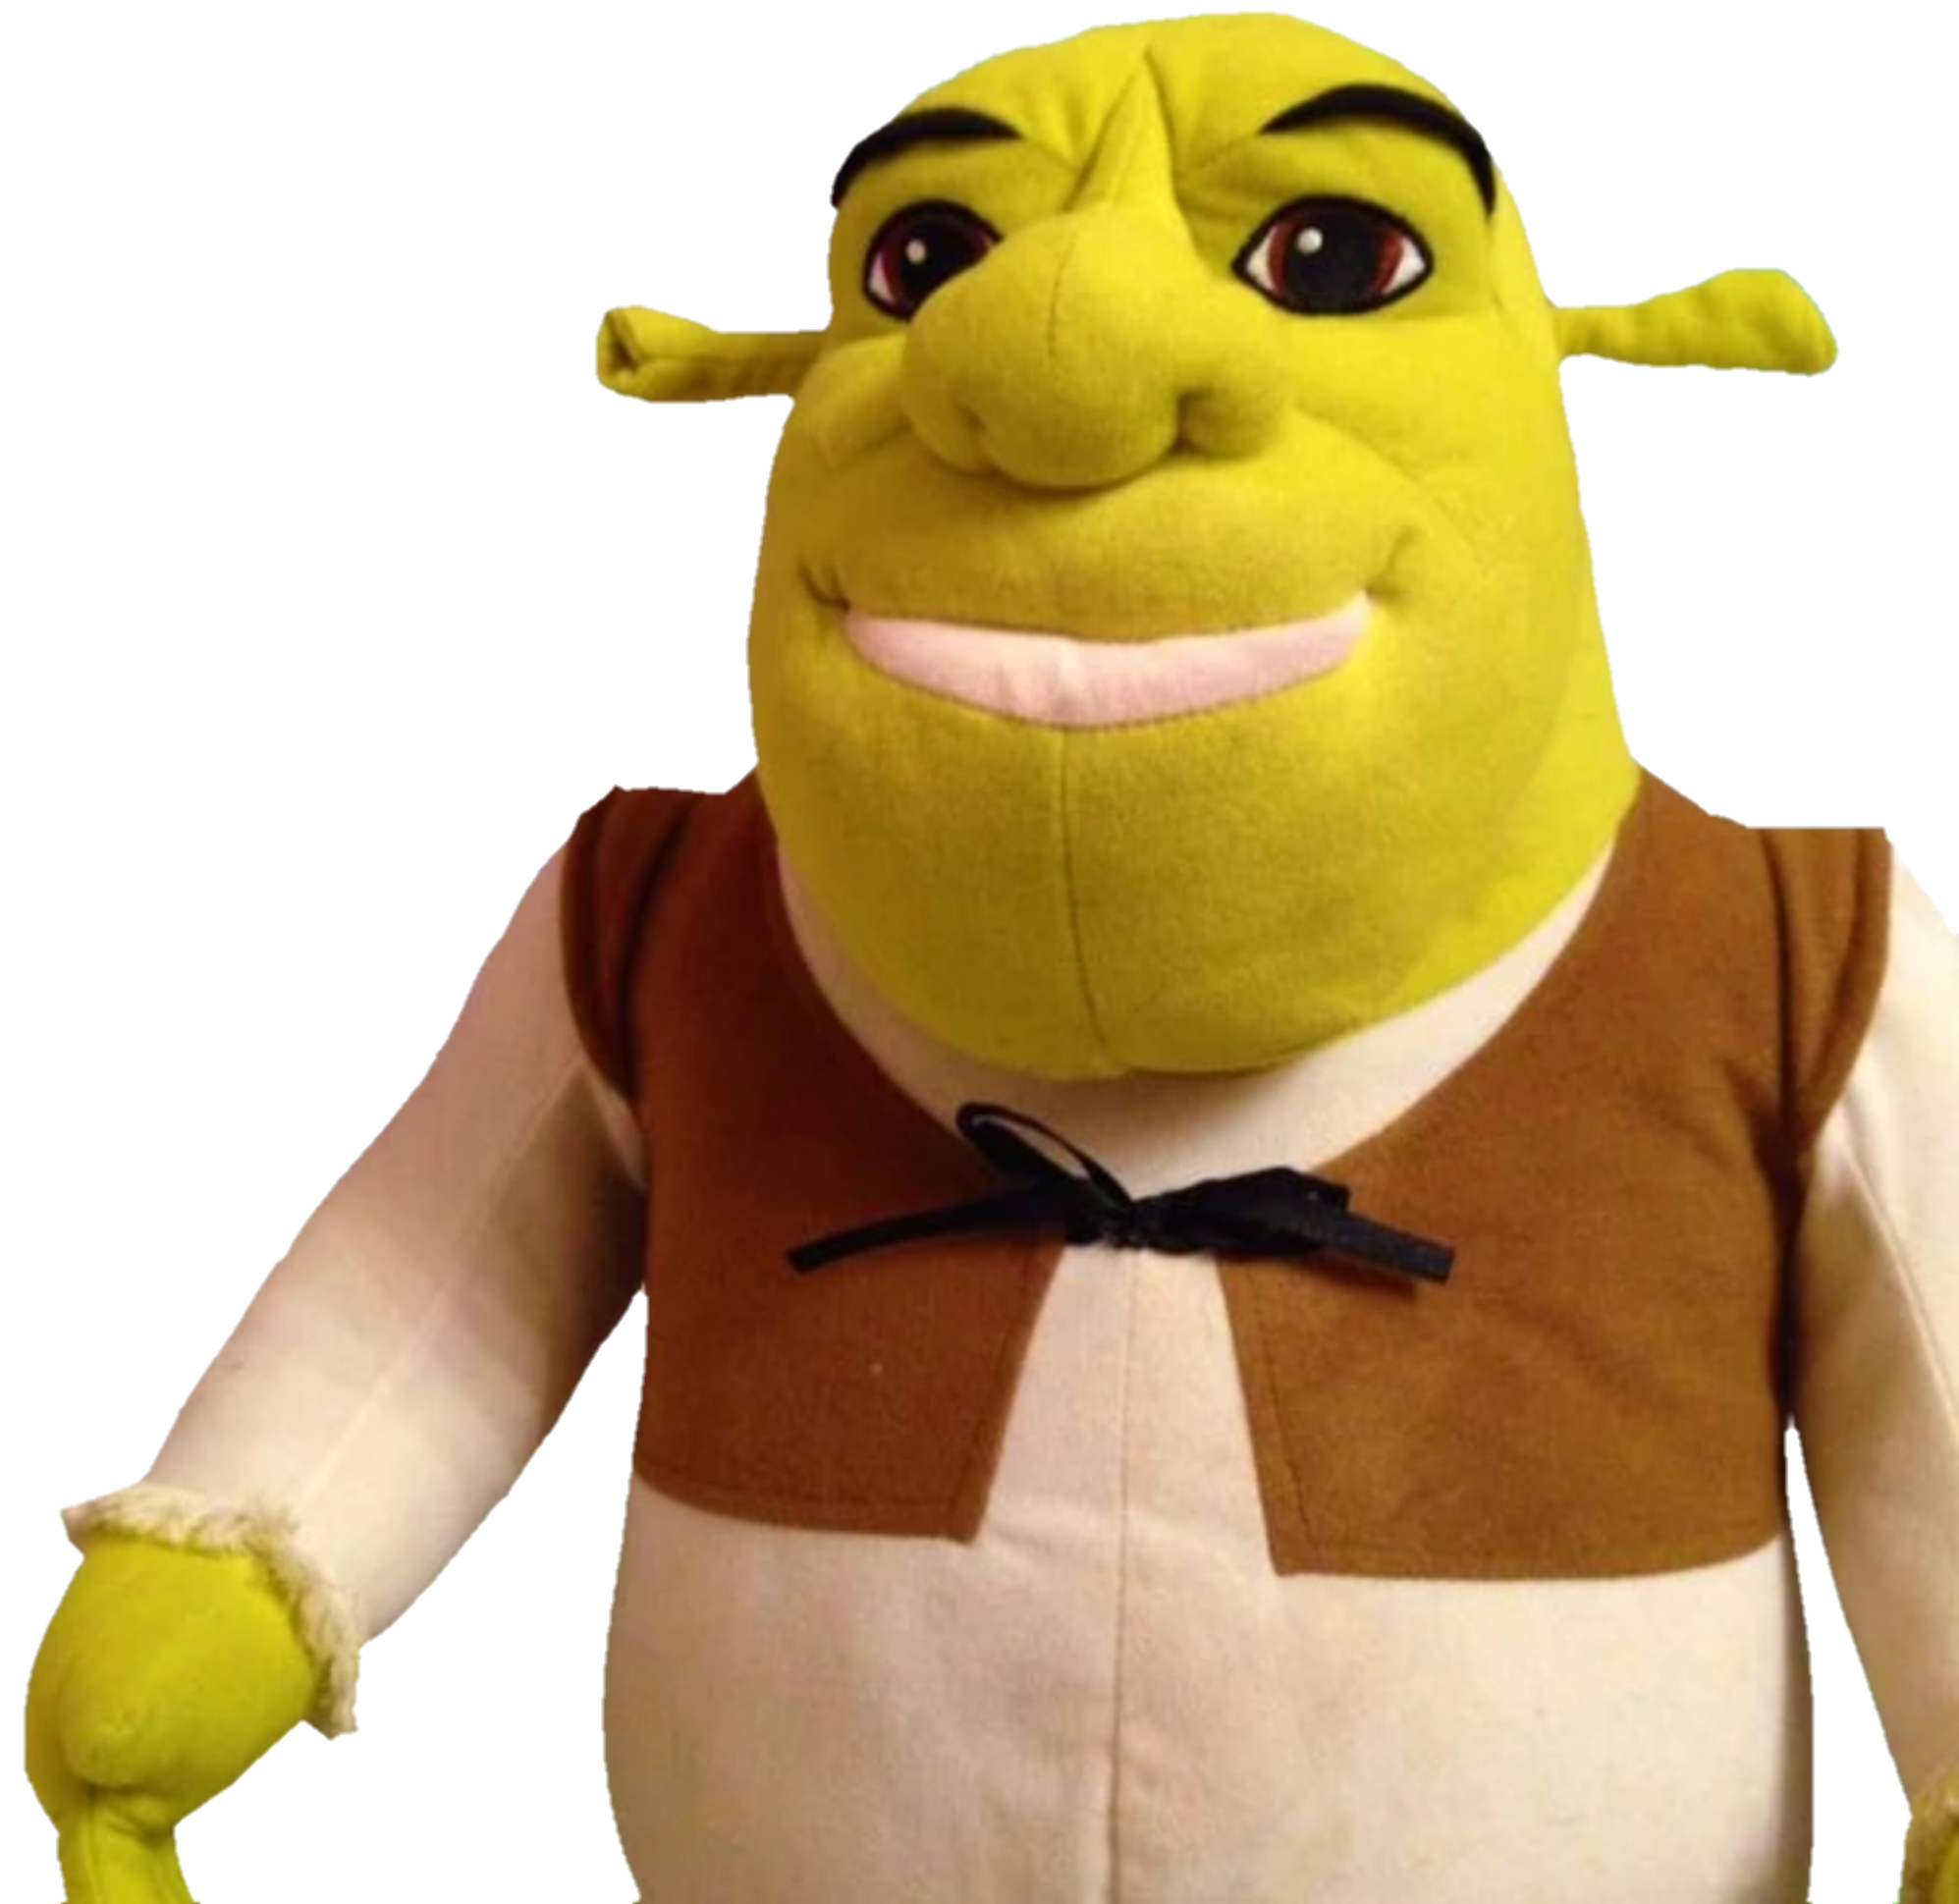 Shrek Supermariologan Wiki Fandom Powered By Wikia